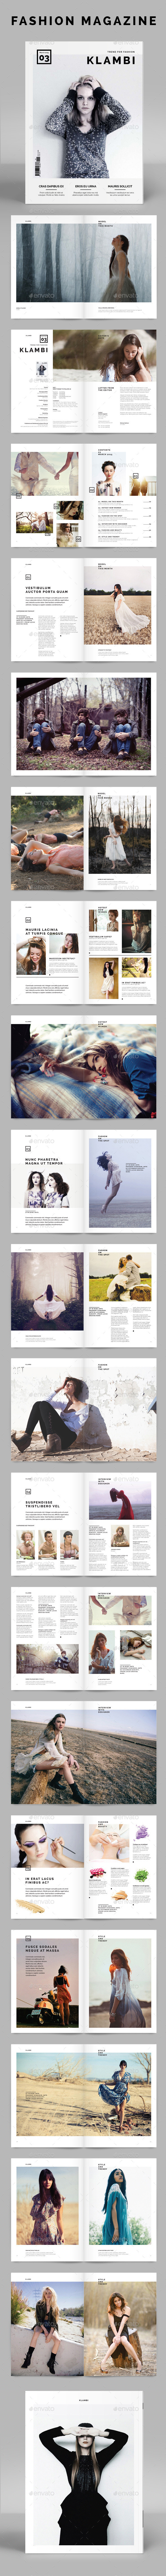 Fashion Magazine Klambi - Magazines Print Templates